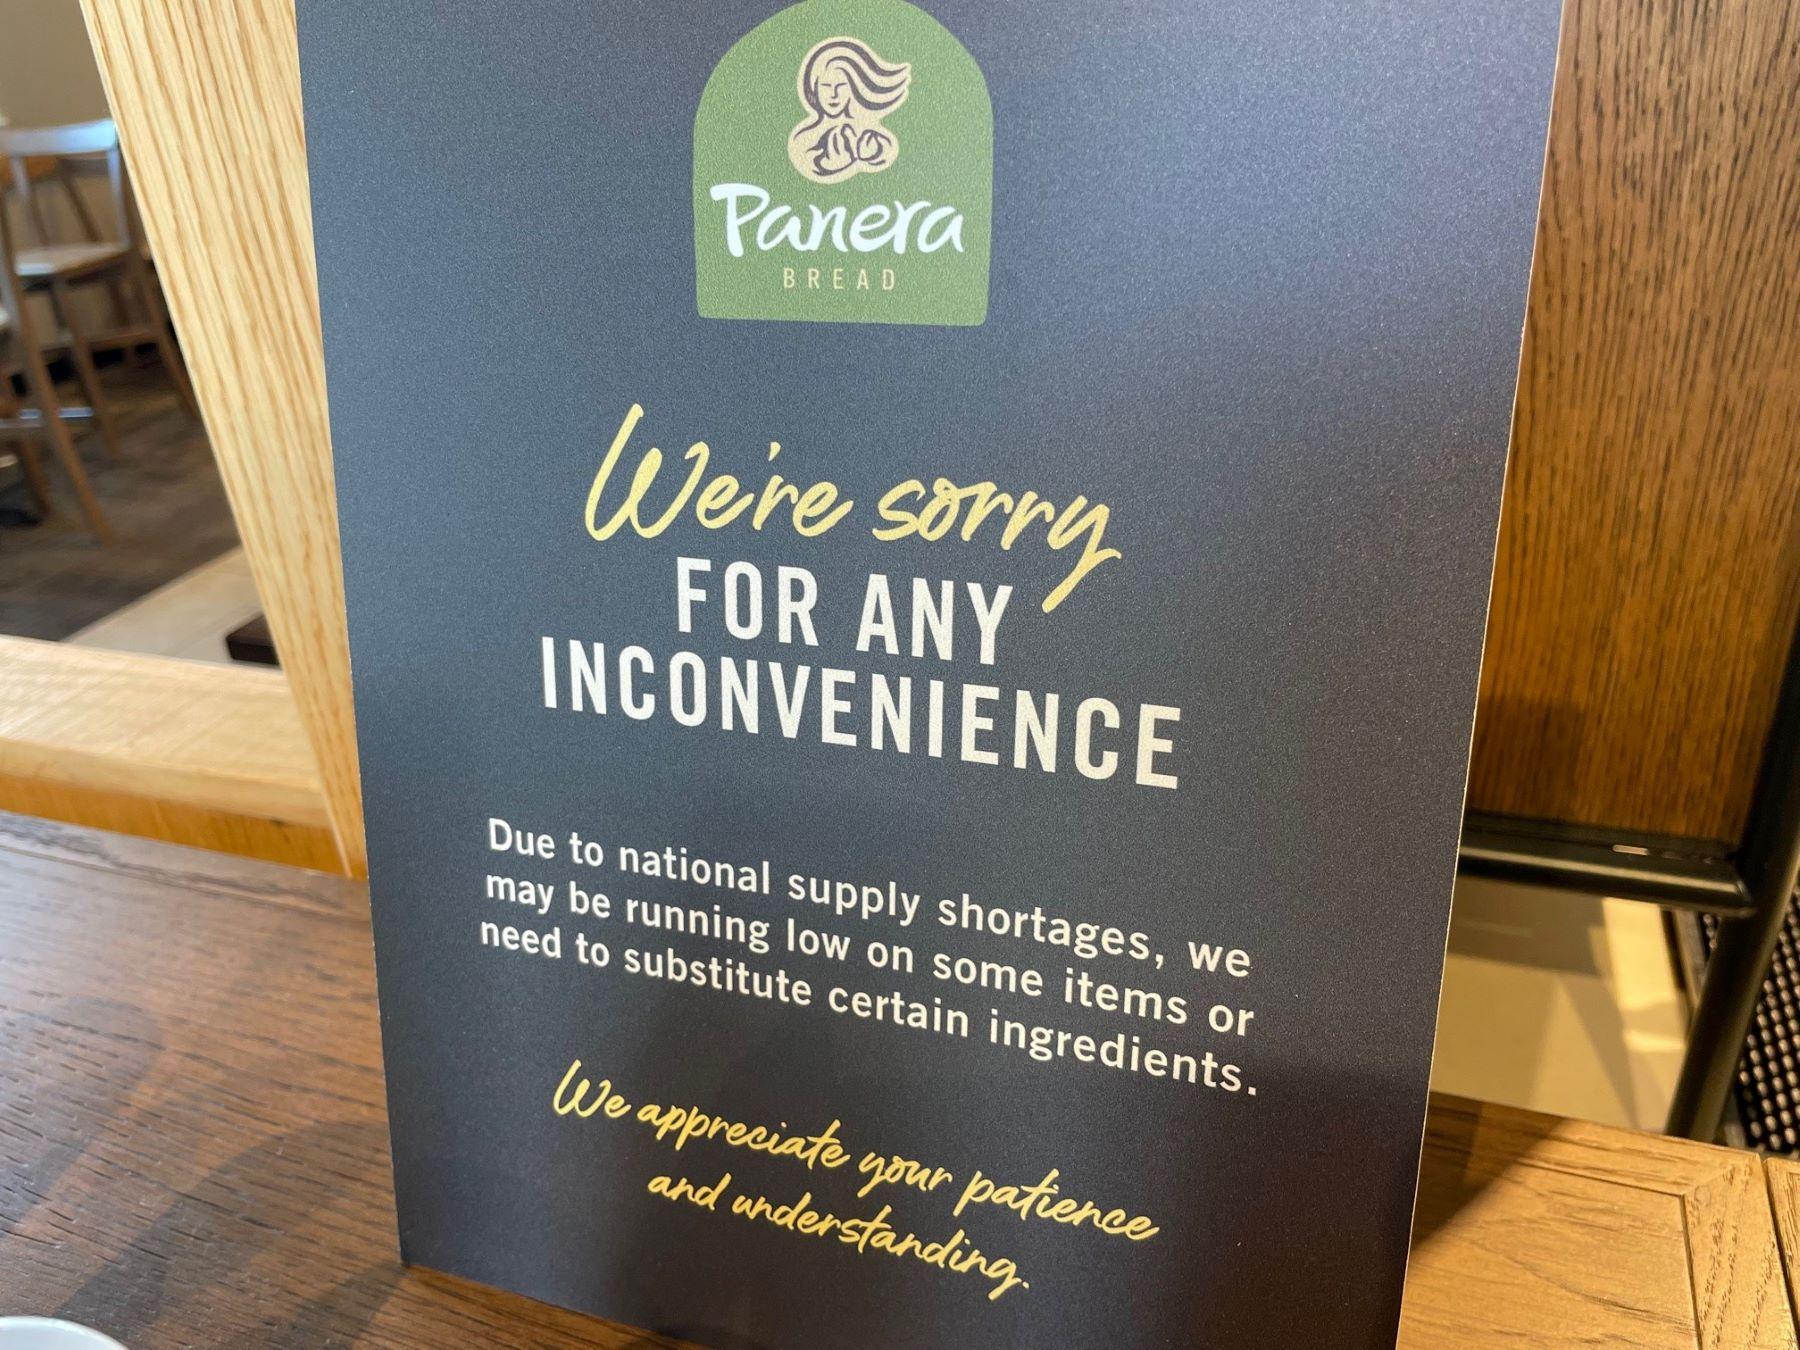 Panera Bread shortage